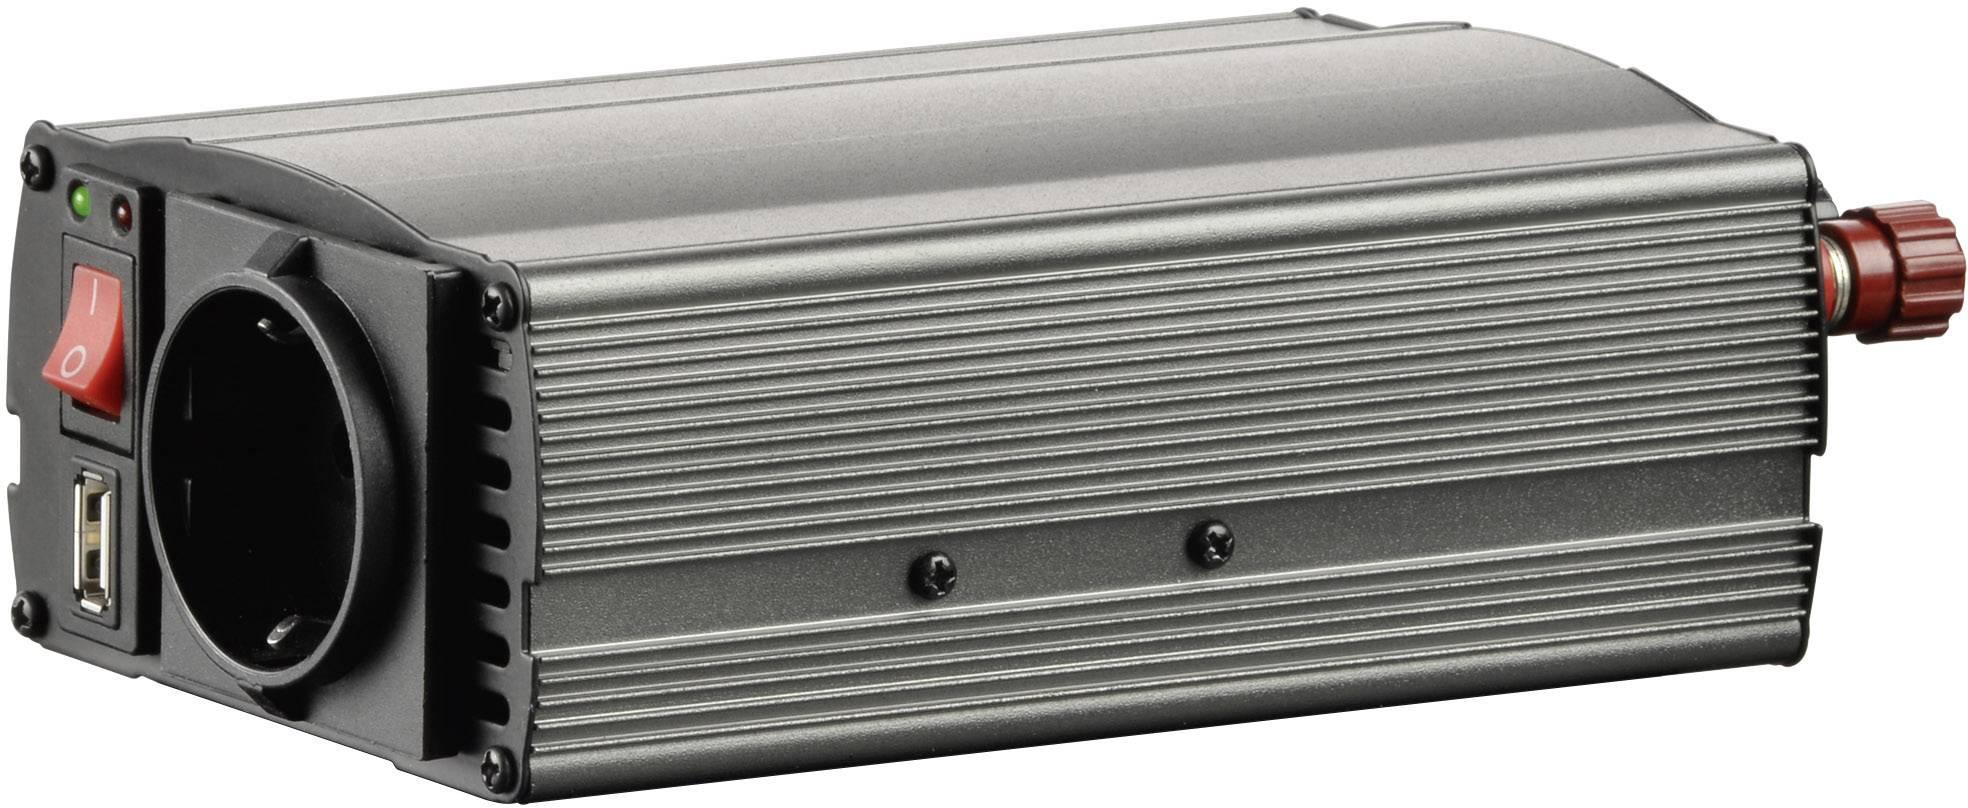 Menič napätia Voltcraft MSW 300-12-G USB, 12 V/DC, 300 W